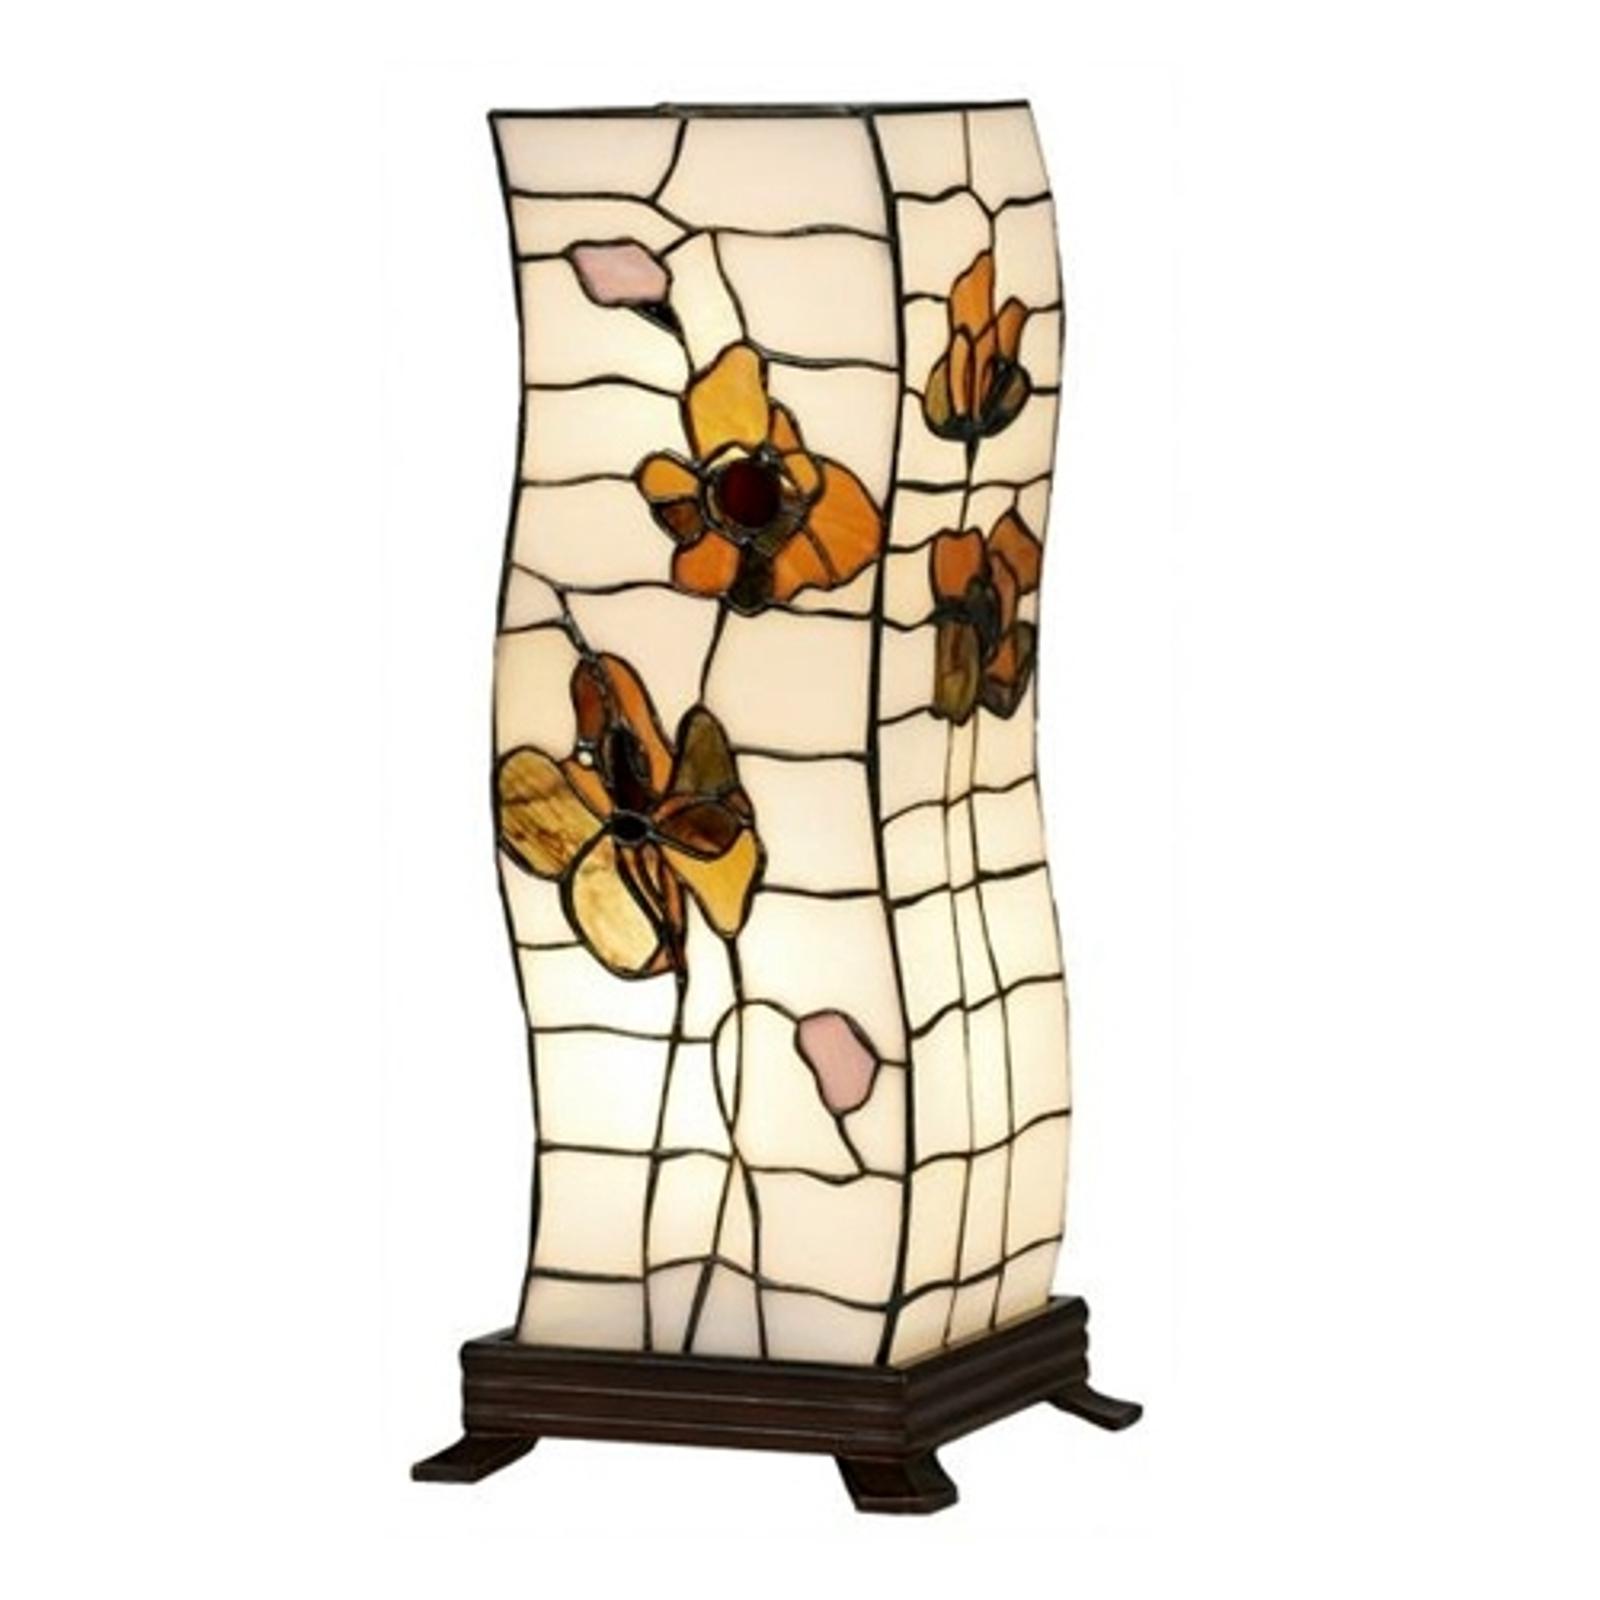 Tiffany-tyylinen Blossom-pöytävalaisin